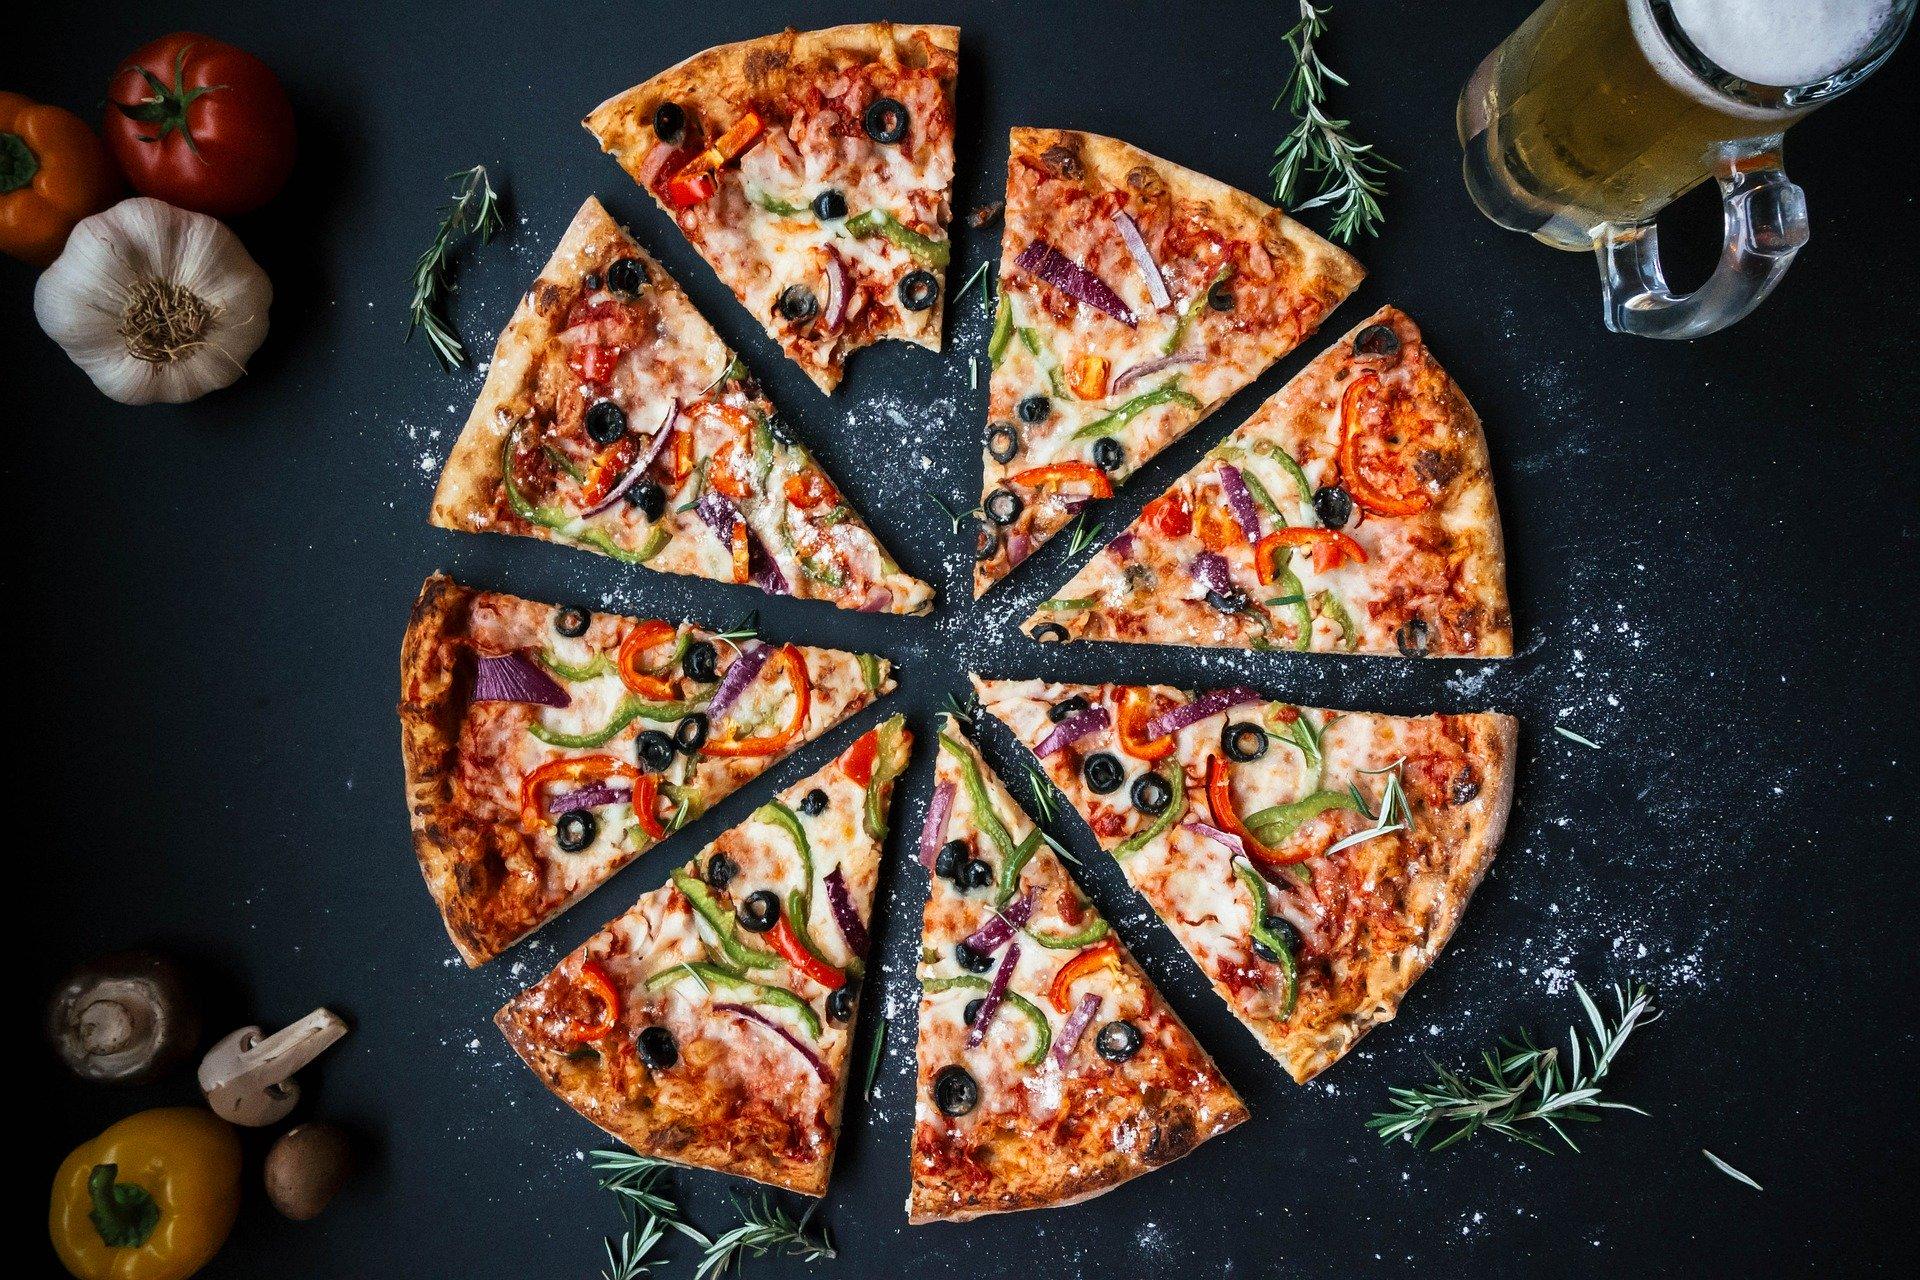 Jægergårdsgade pizza